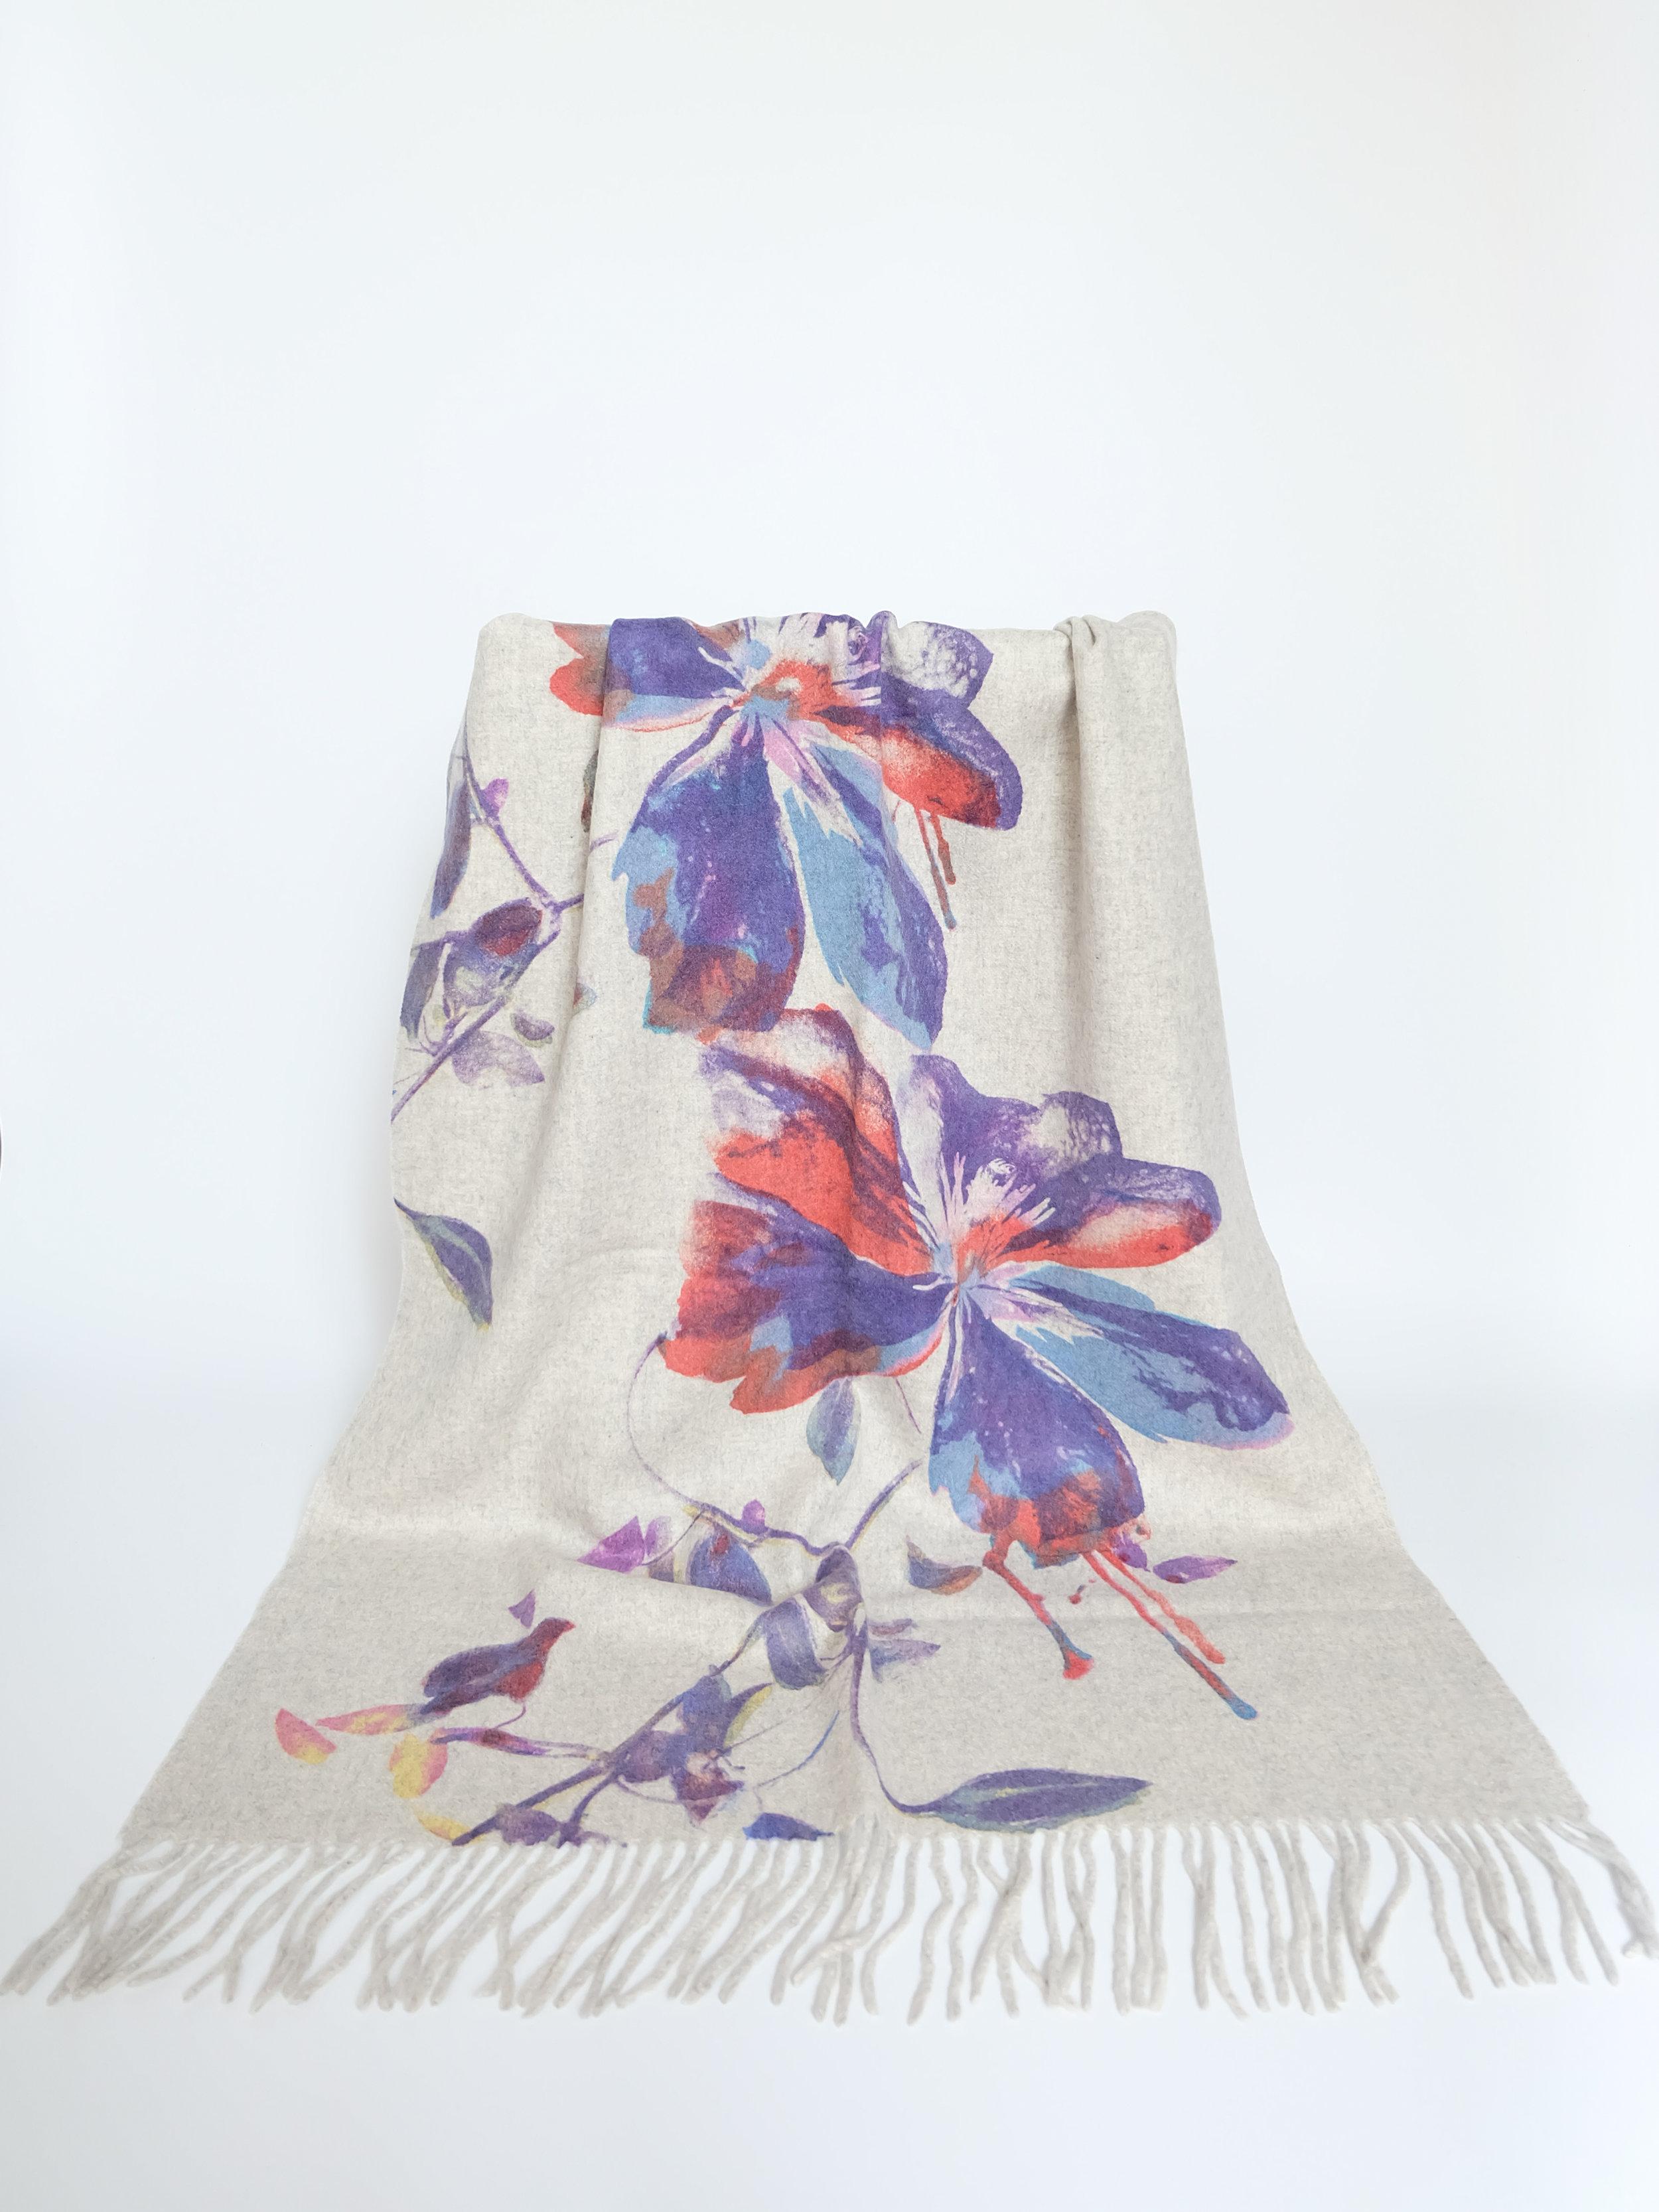 Liquid Blossom (White) - 65x180cm